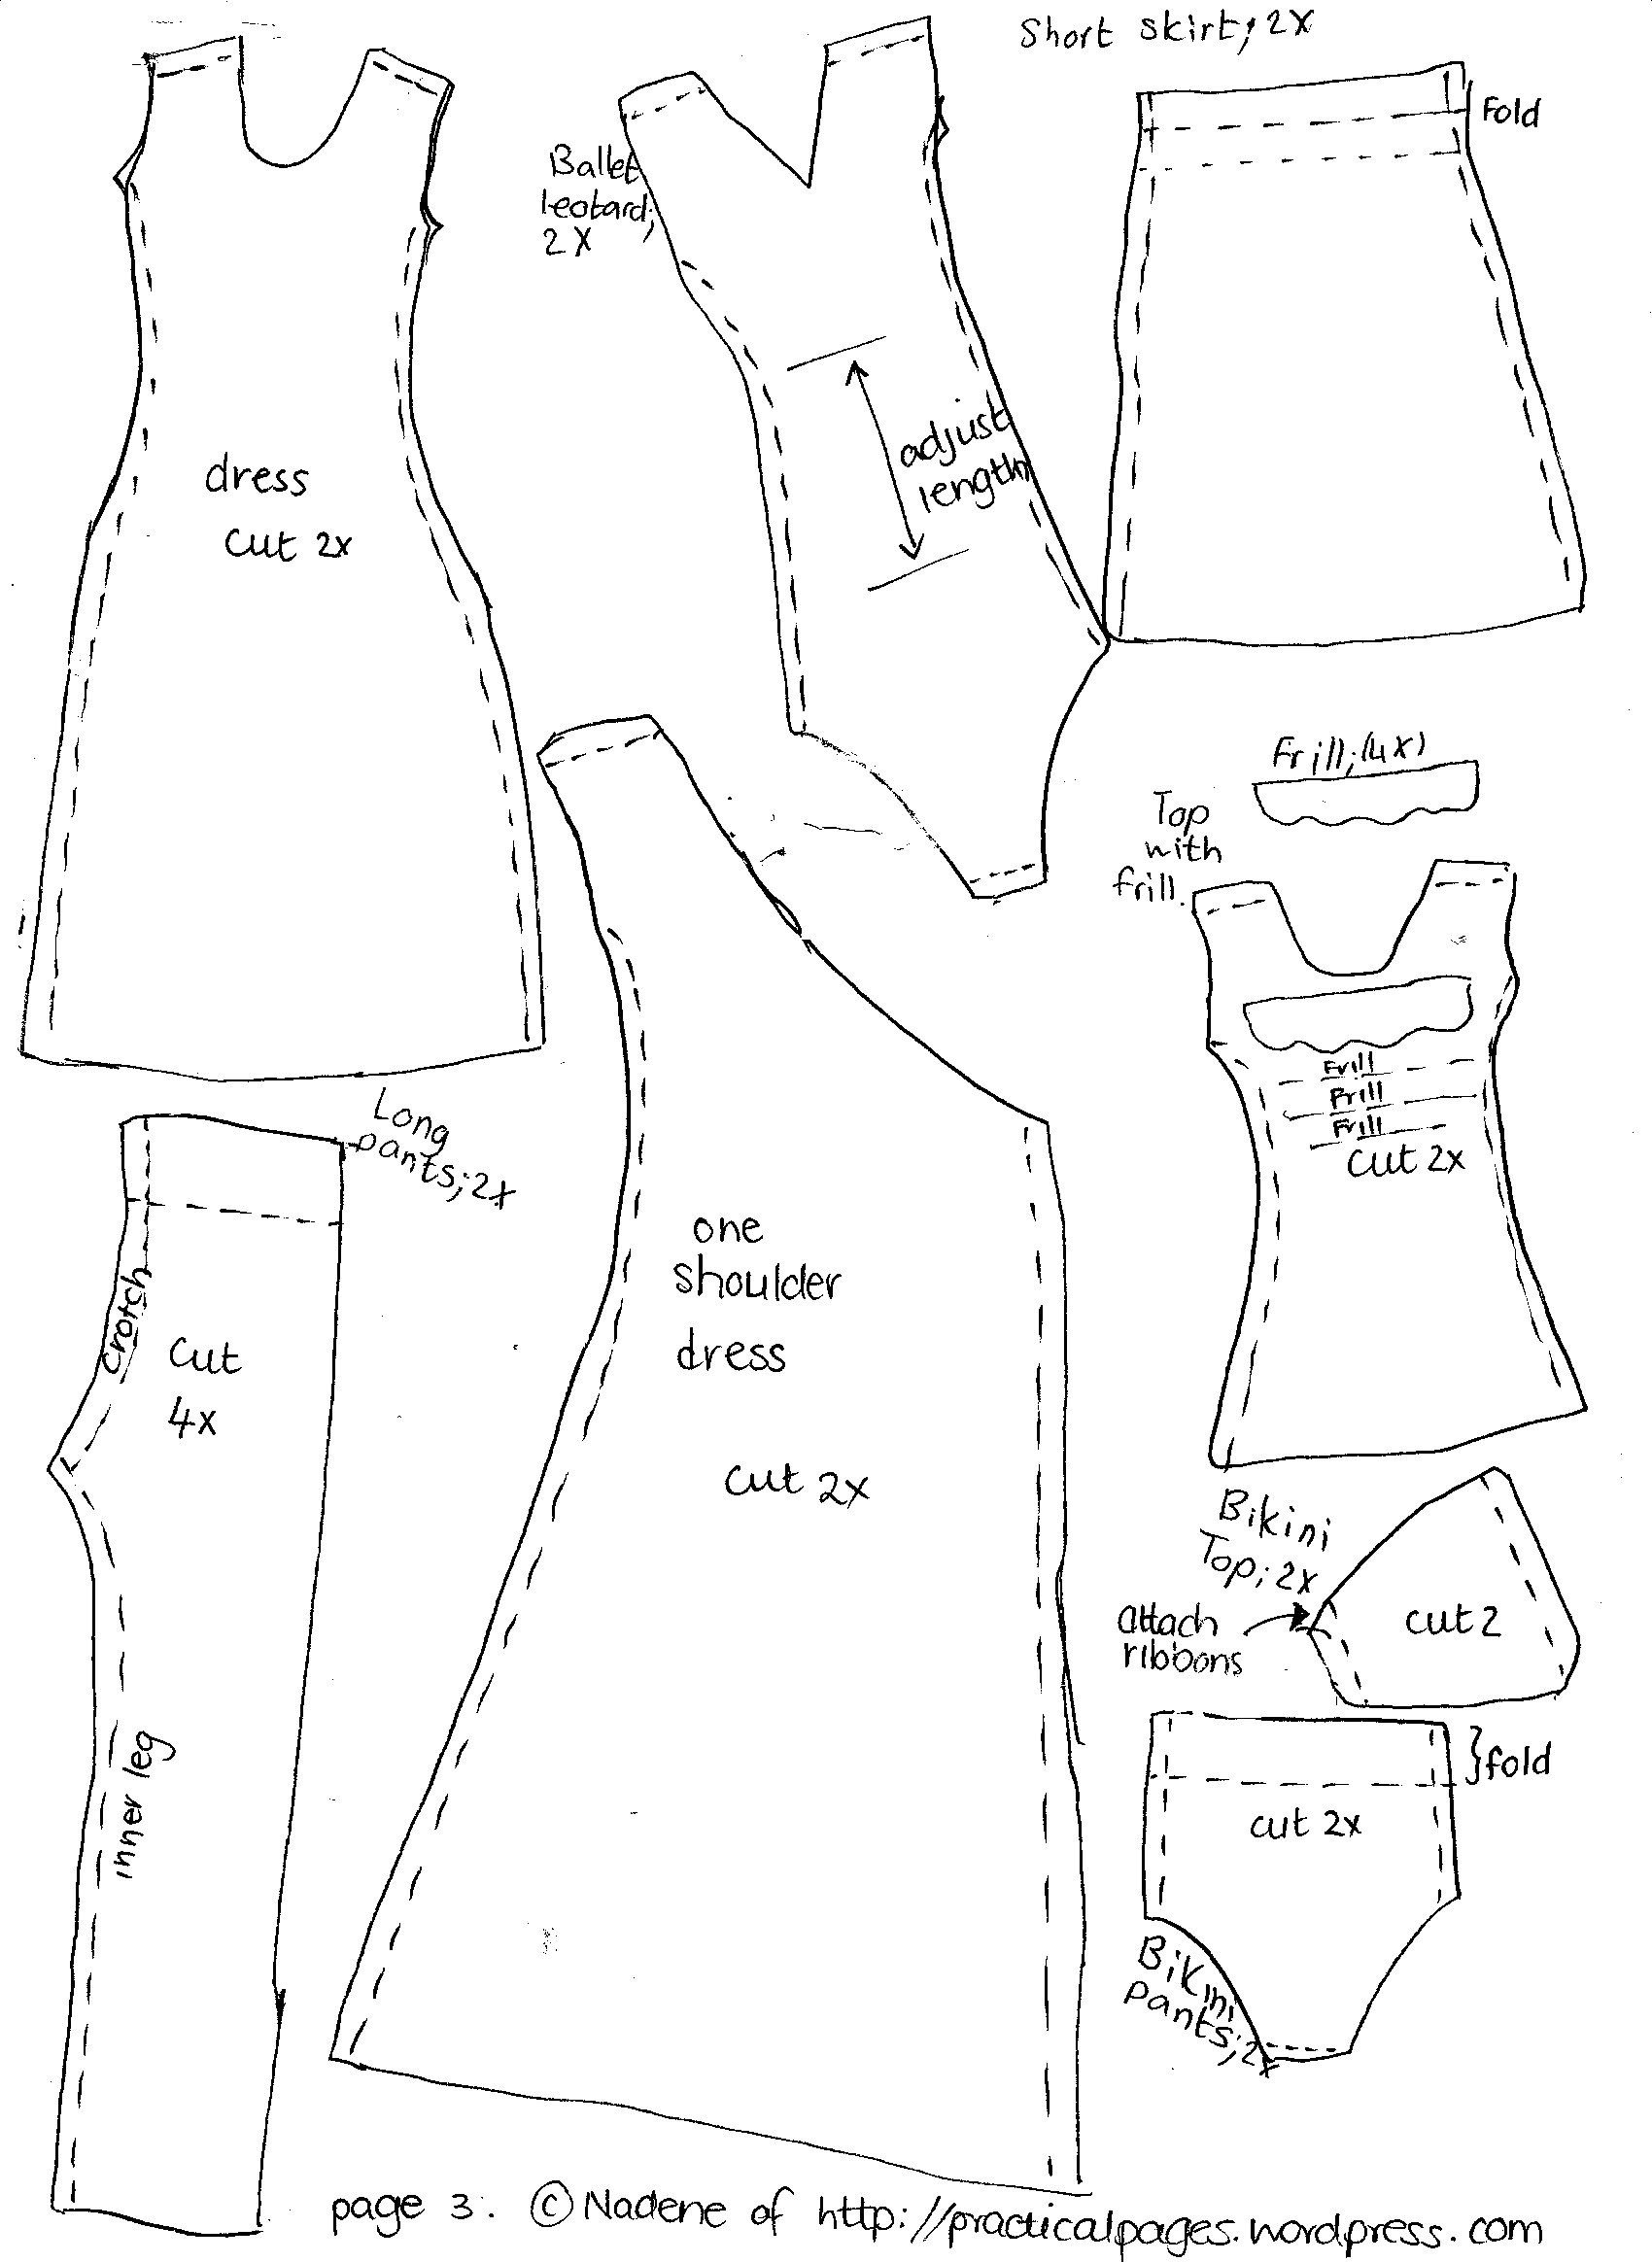 Make A Rag Doll Family | Vicki | Barbie Clothes Patterns, Barbie - Barbie Dress Patterns Free Printable Pdf